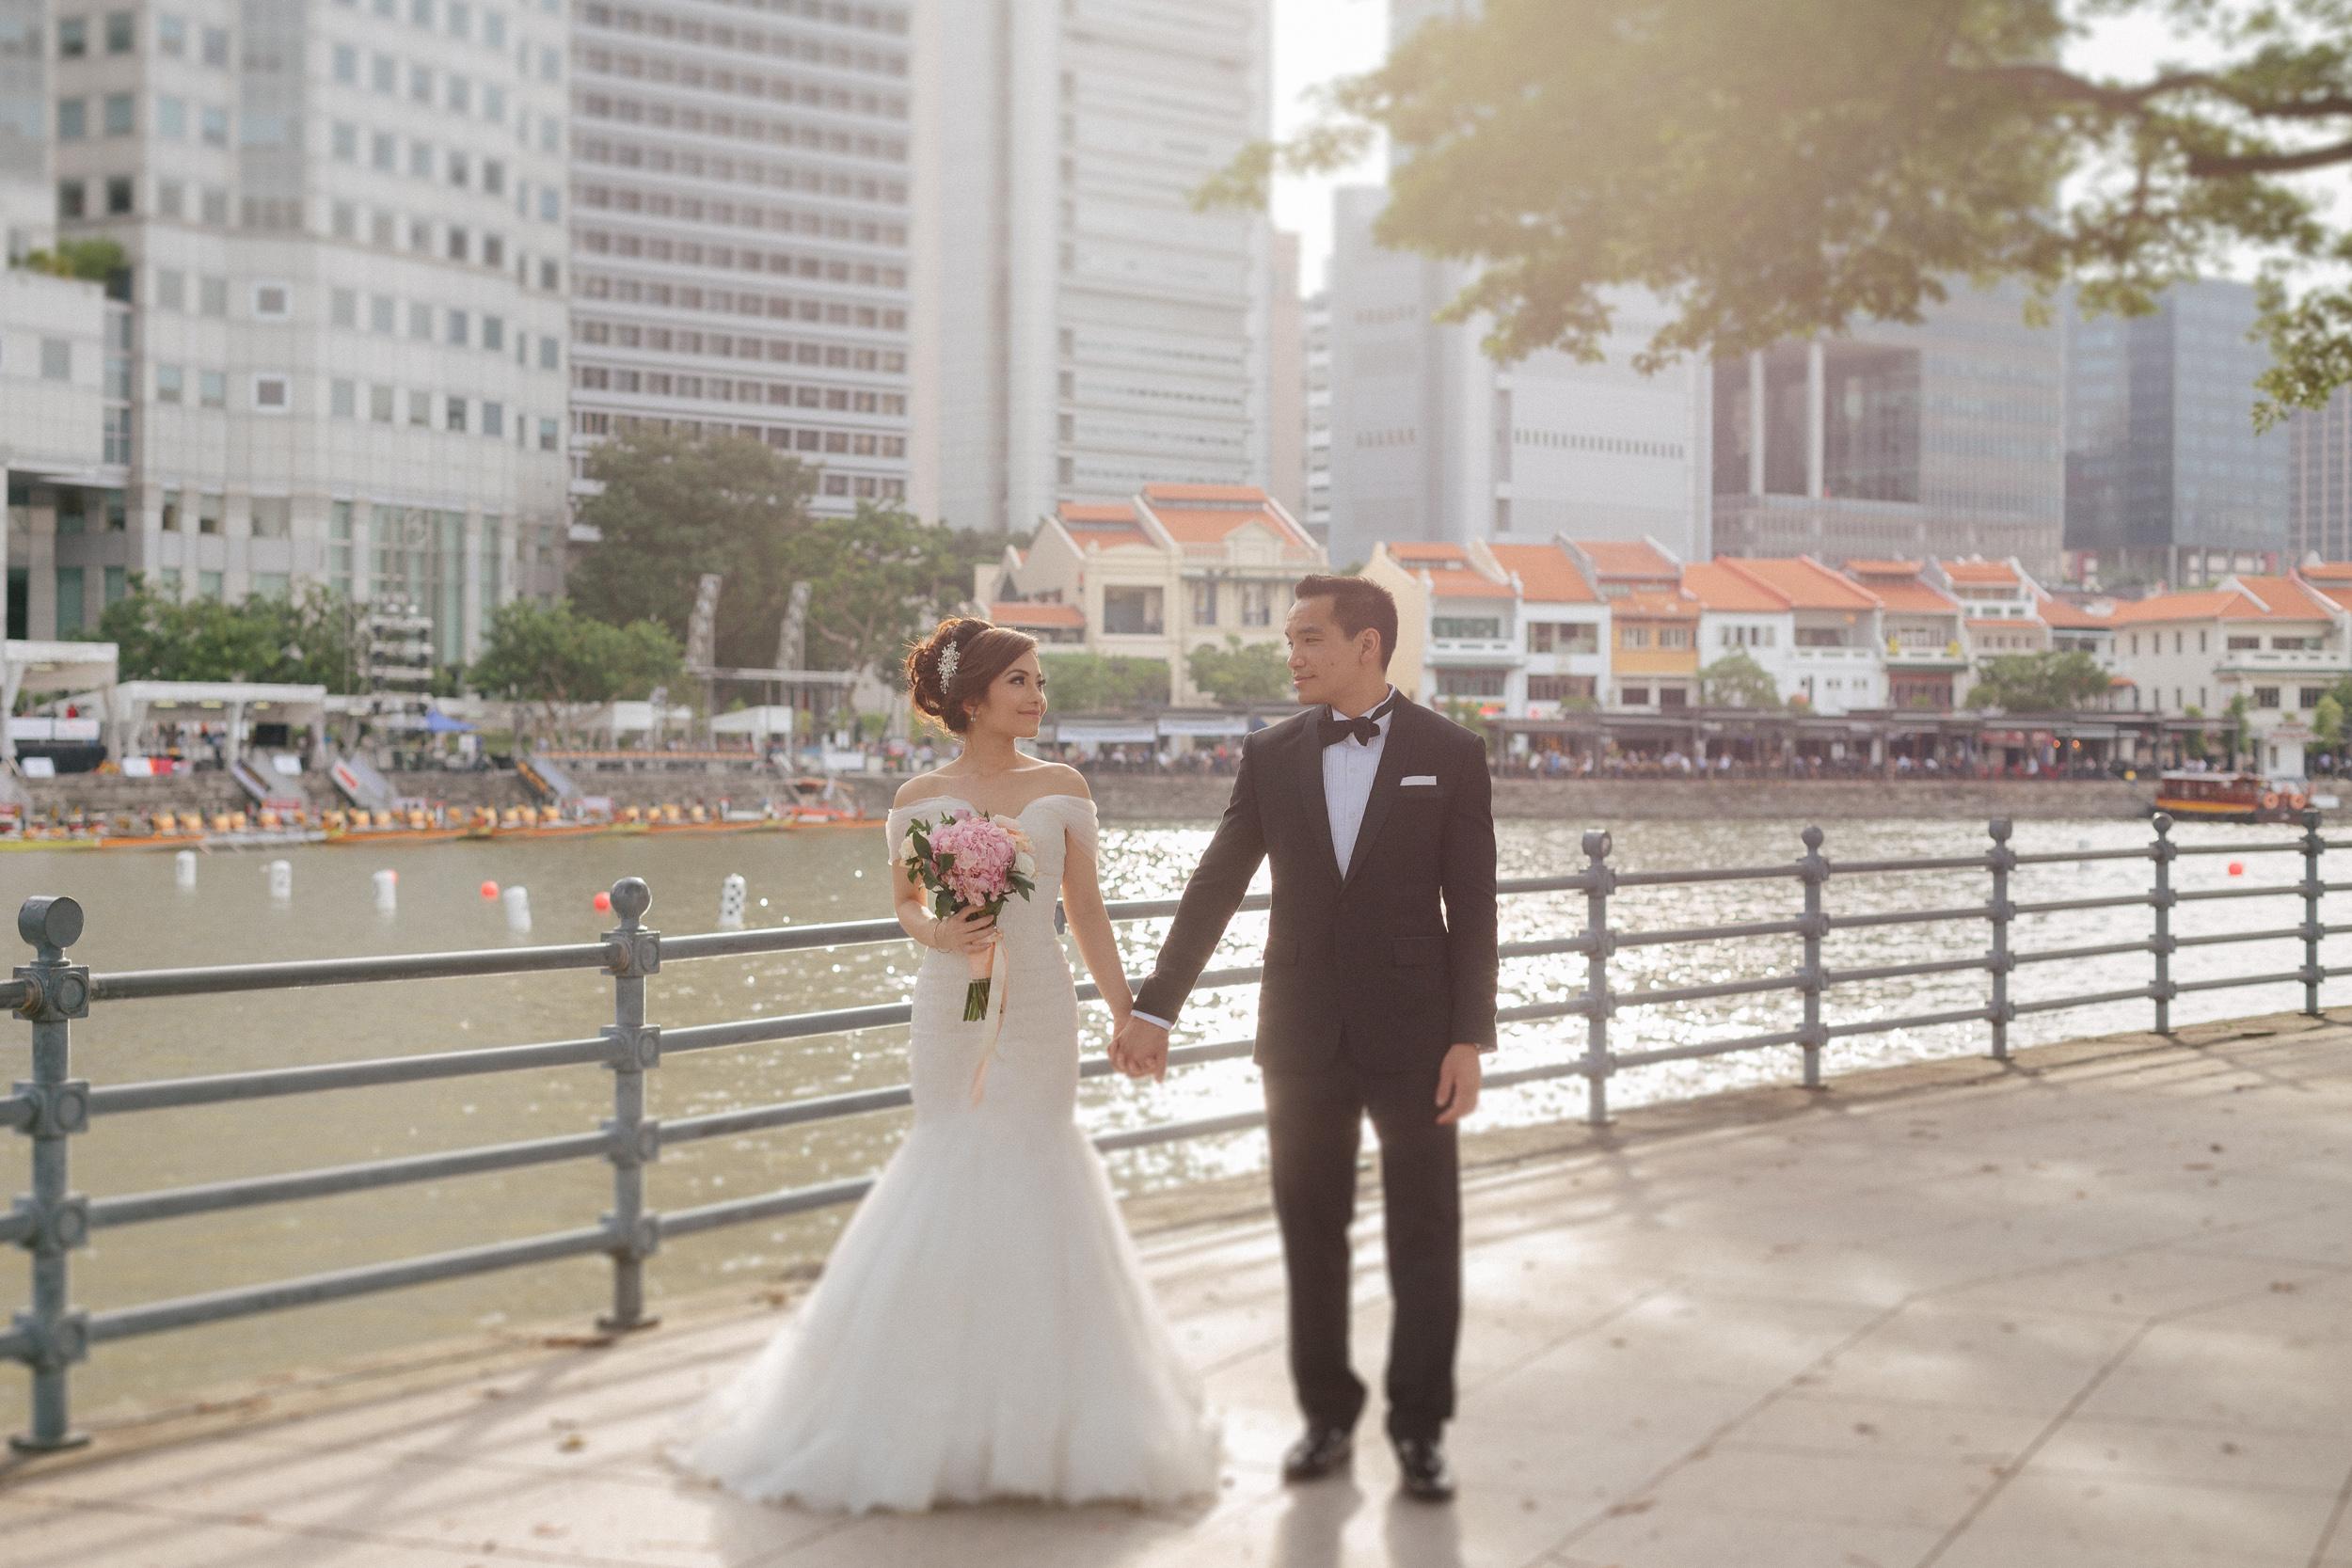 singapore-wedding-photographer-cheryl-matthew-fullerton-hotel-wedding-47.jpg